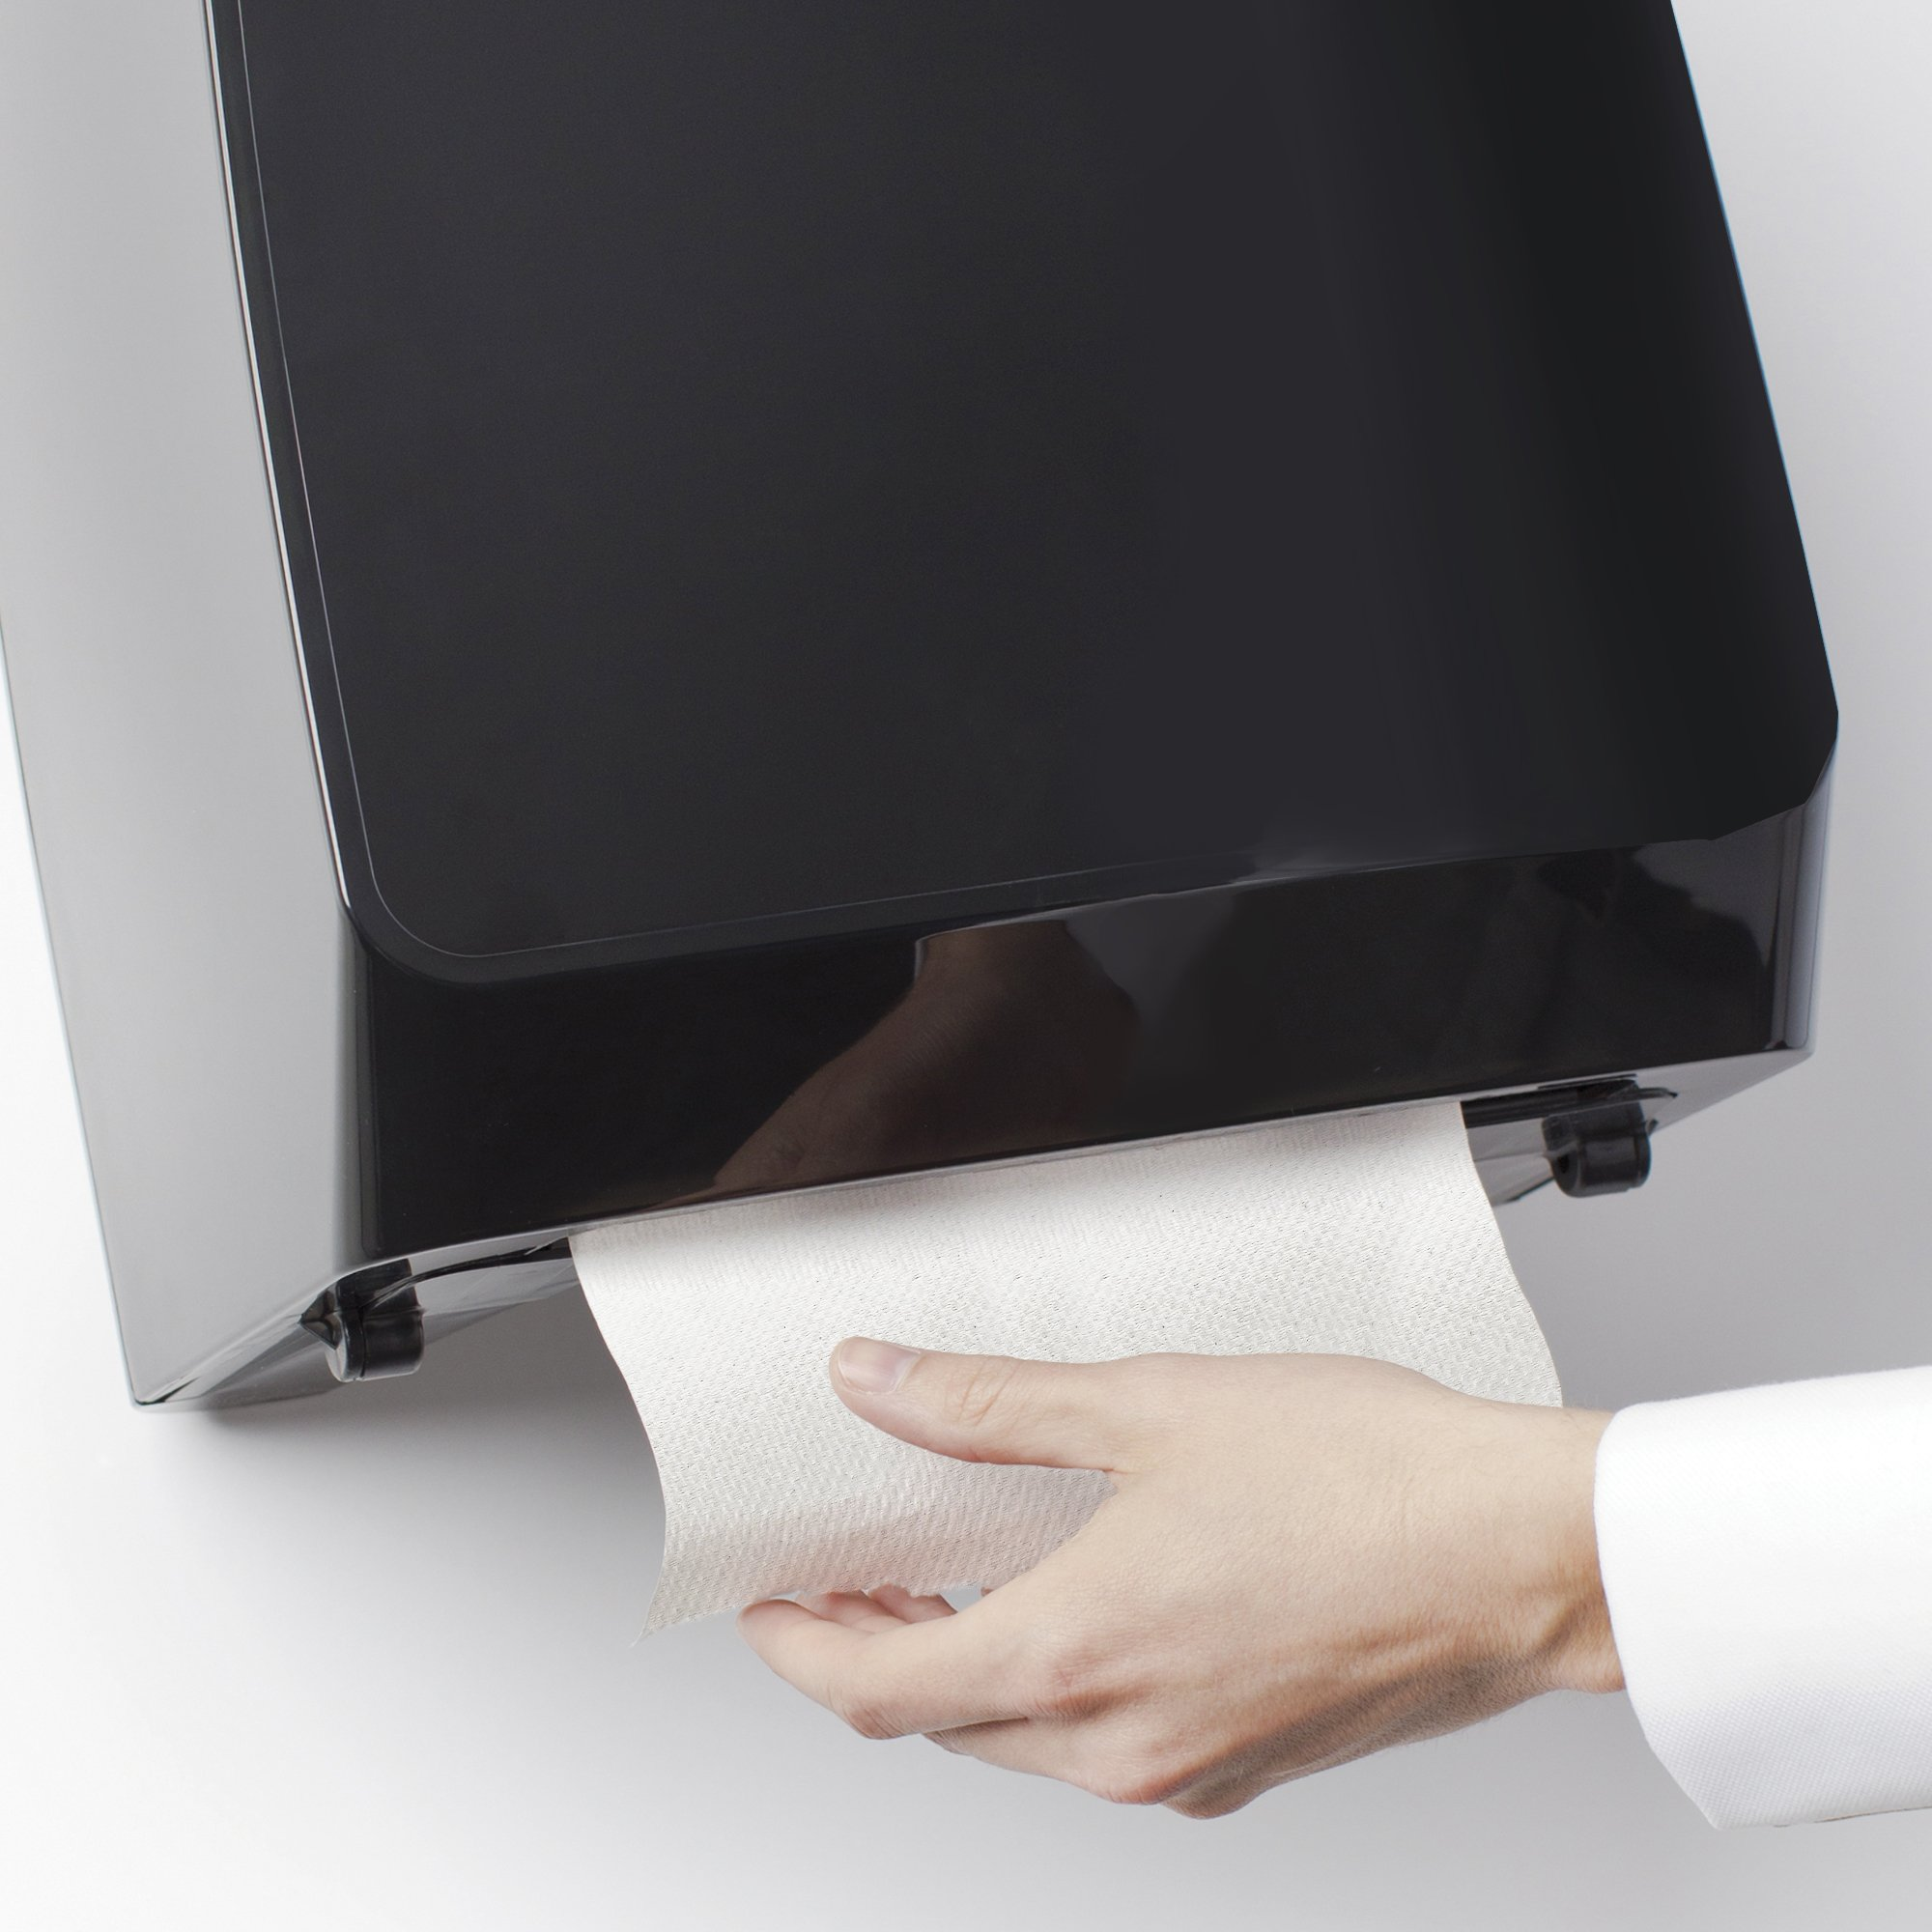 Scott Essential Hard Roll Paper Towels (01040), White, 800' / Roll, 12 Rolls / Case, 9,600' / Case